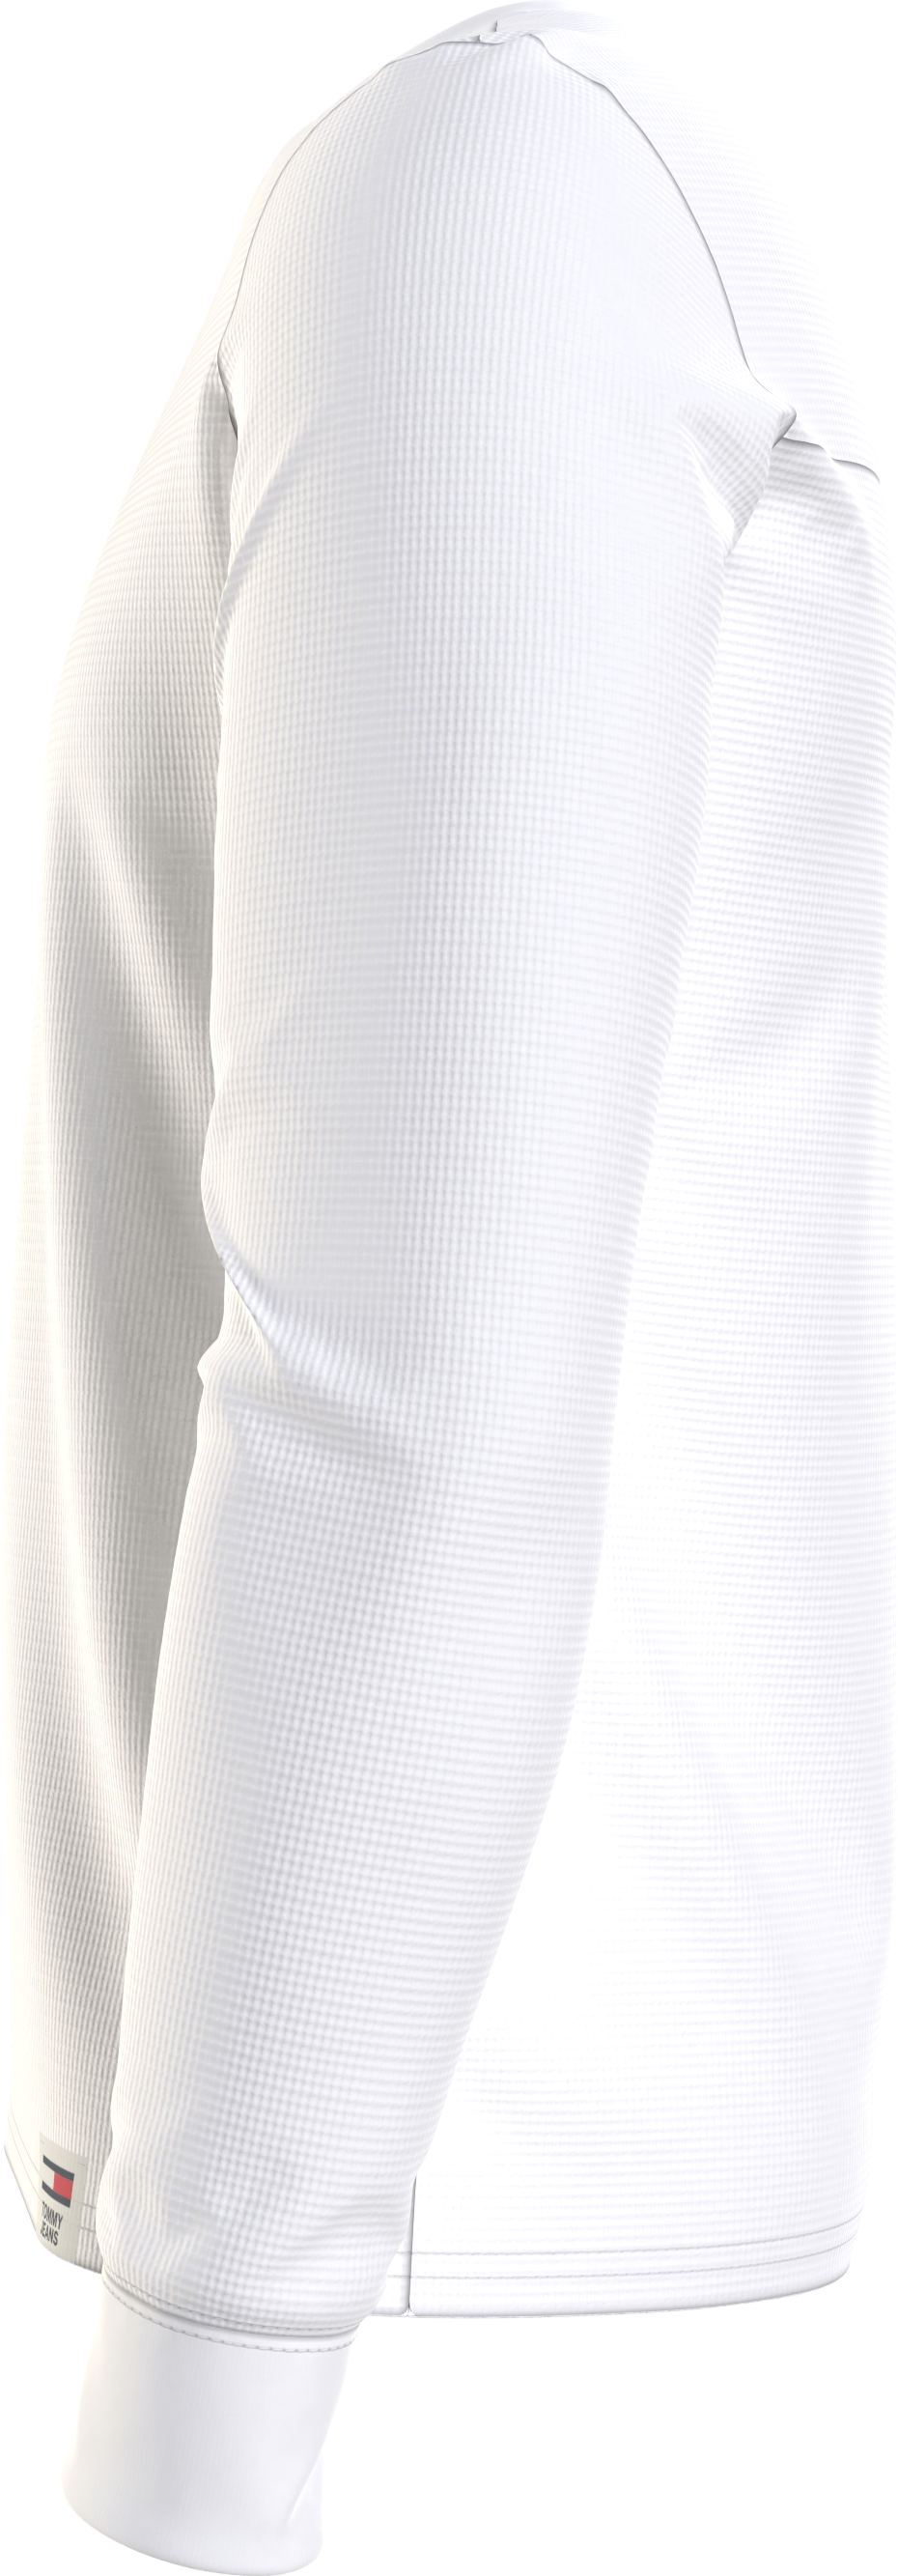 Hilfiger Denim Waffle Snit Sweatshirt, Hvid, M